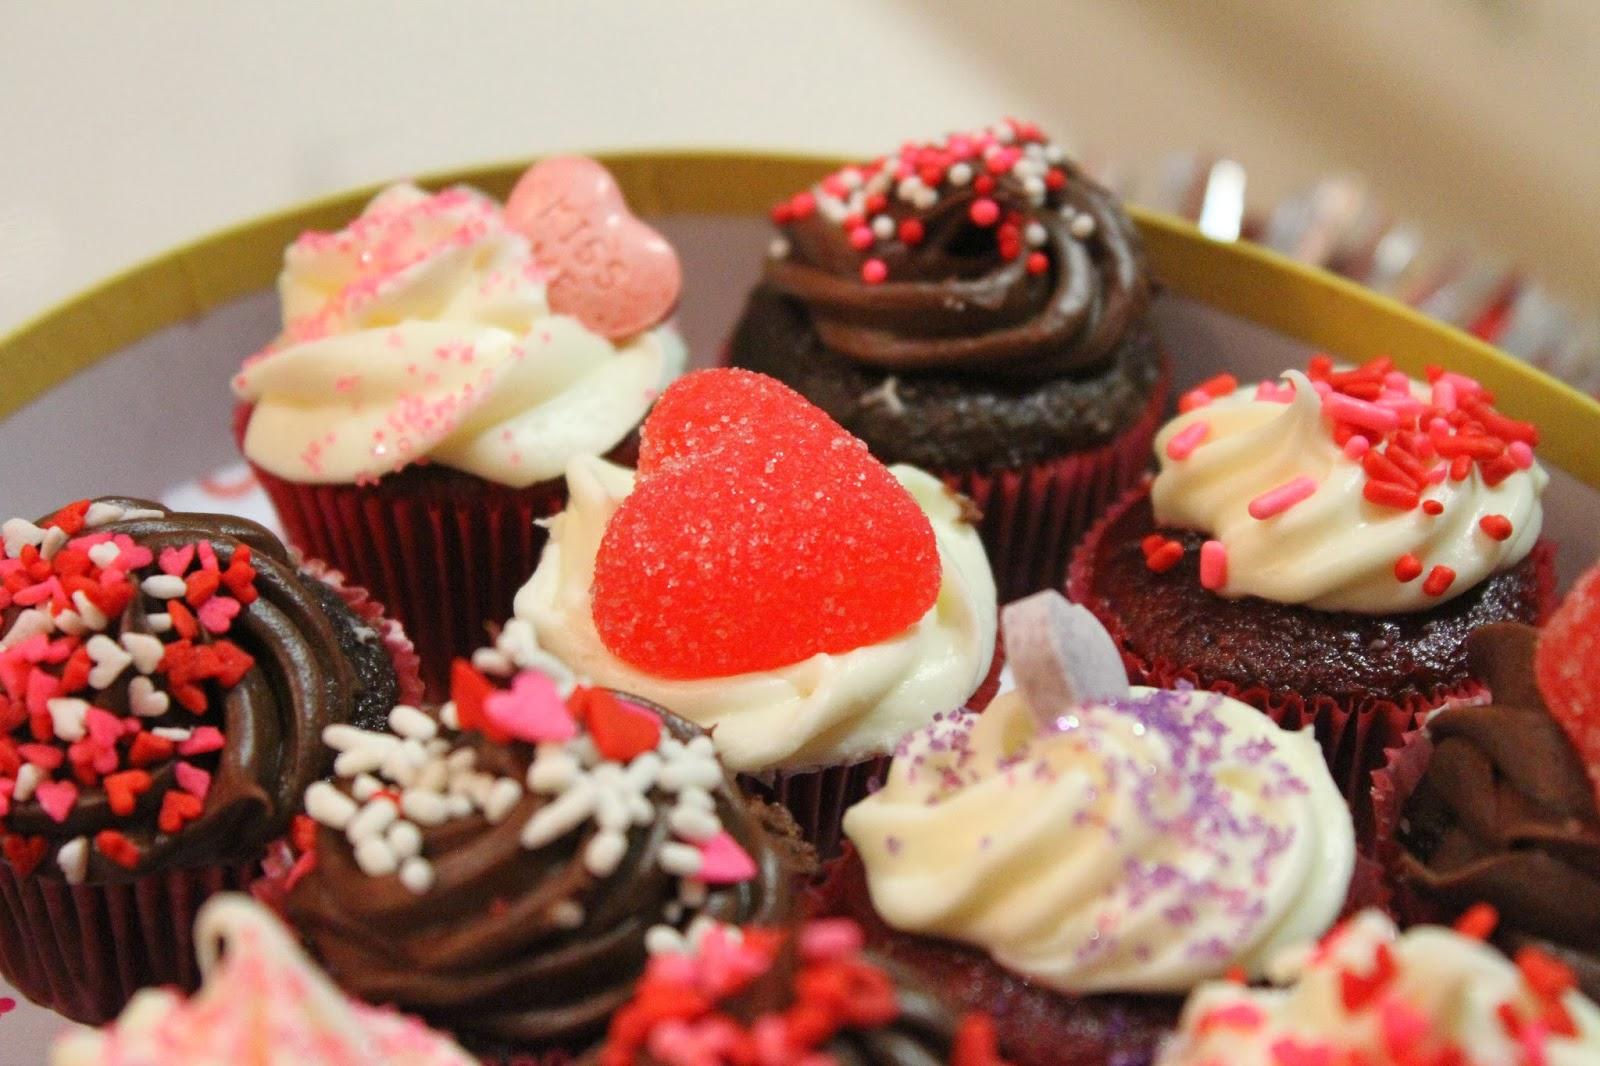 DIY Valentine's Day Cupcakes